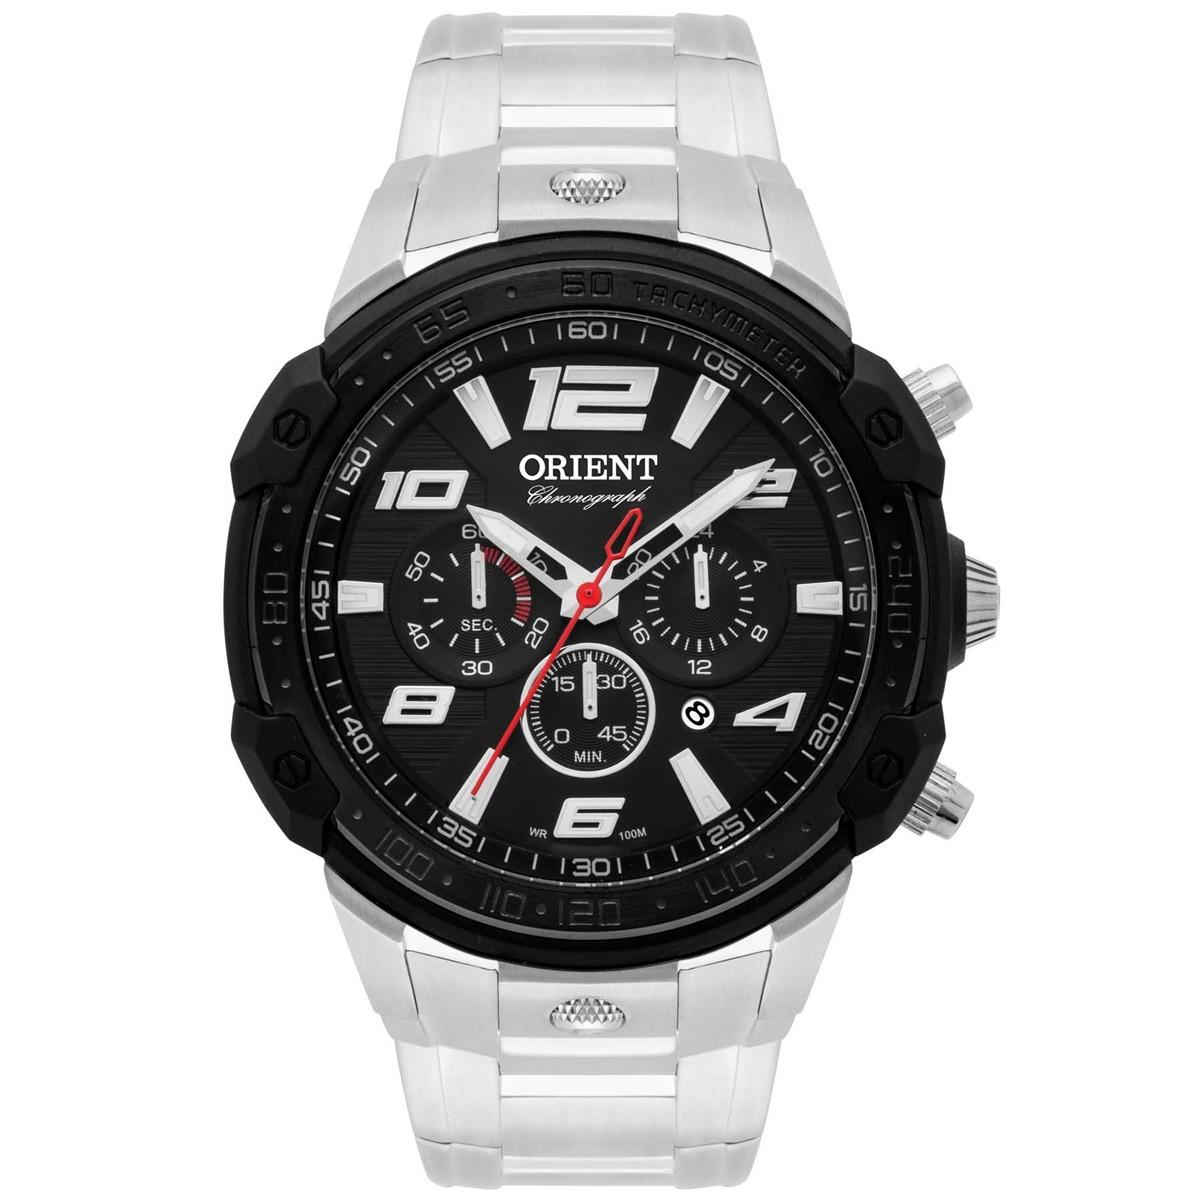 b6294385e Relógio Orient Sport Masculino Cronógrafo Analógico Mbssc172 - R ...